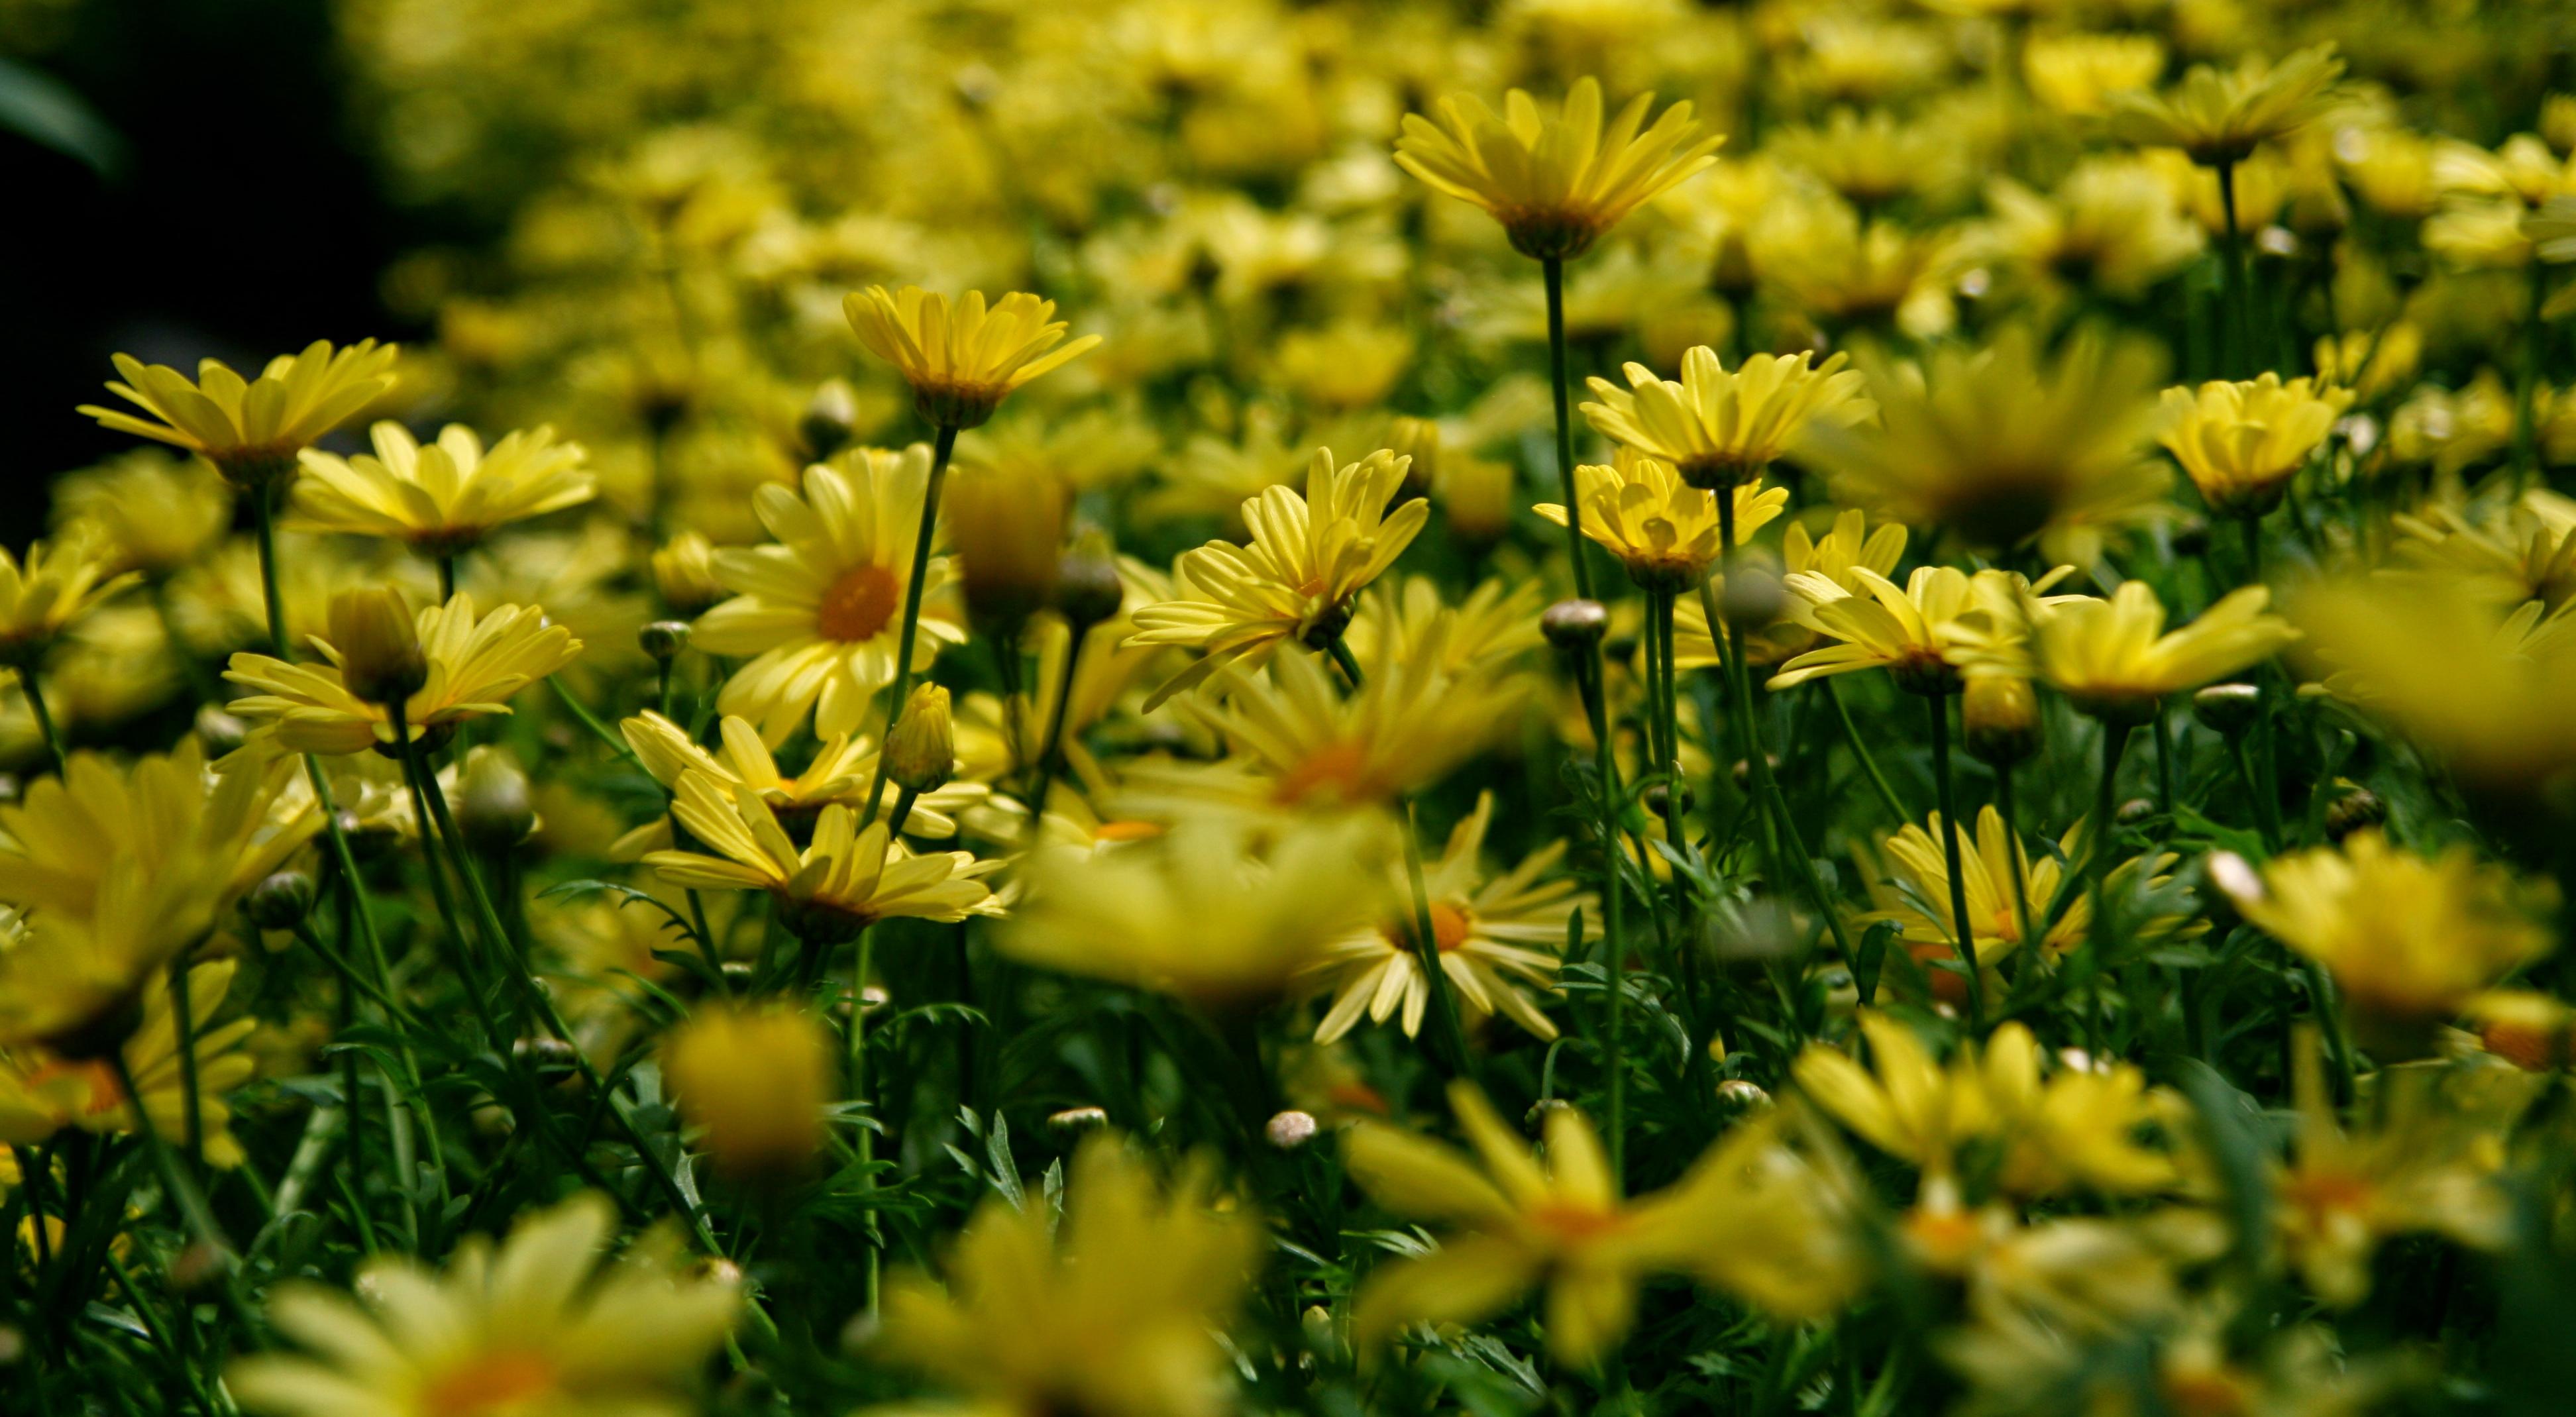 Yellow Petal Flower Field · Free Stock Photo